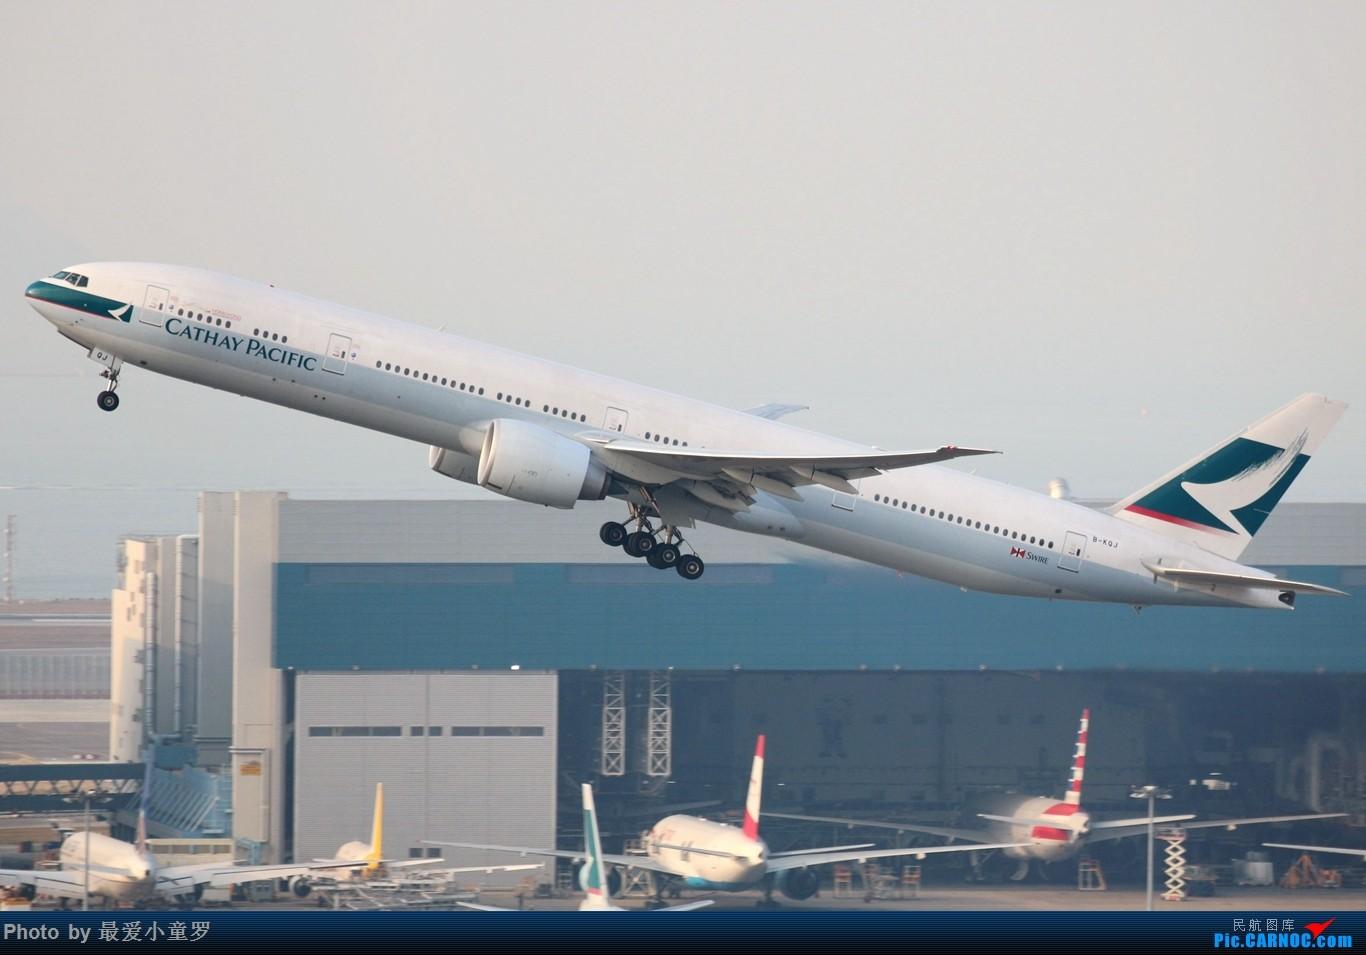 Re:[原创]2015年1月25日香港沙螺湾烂天拍机第二集——波音777 BOEING 777-300ER B-KQJ 中国香港赤鱲角国际机场